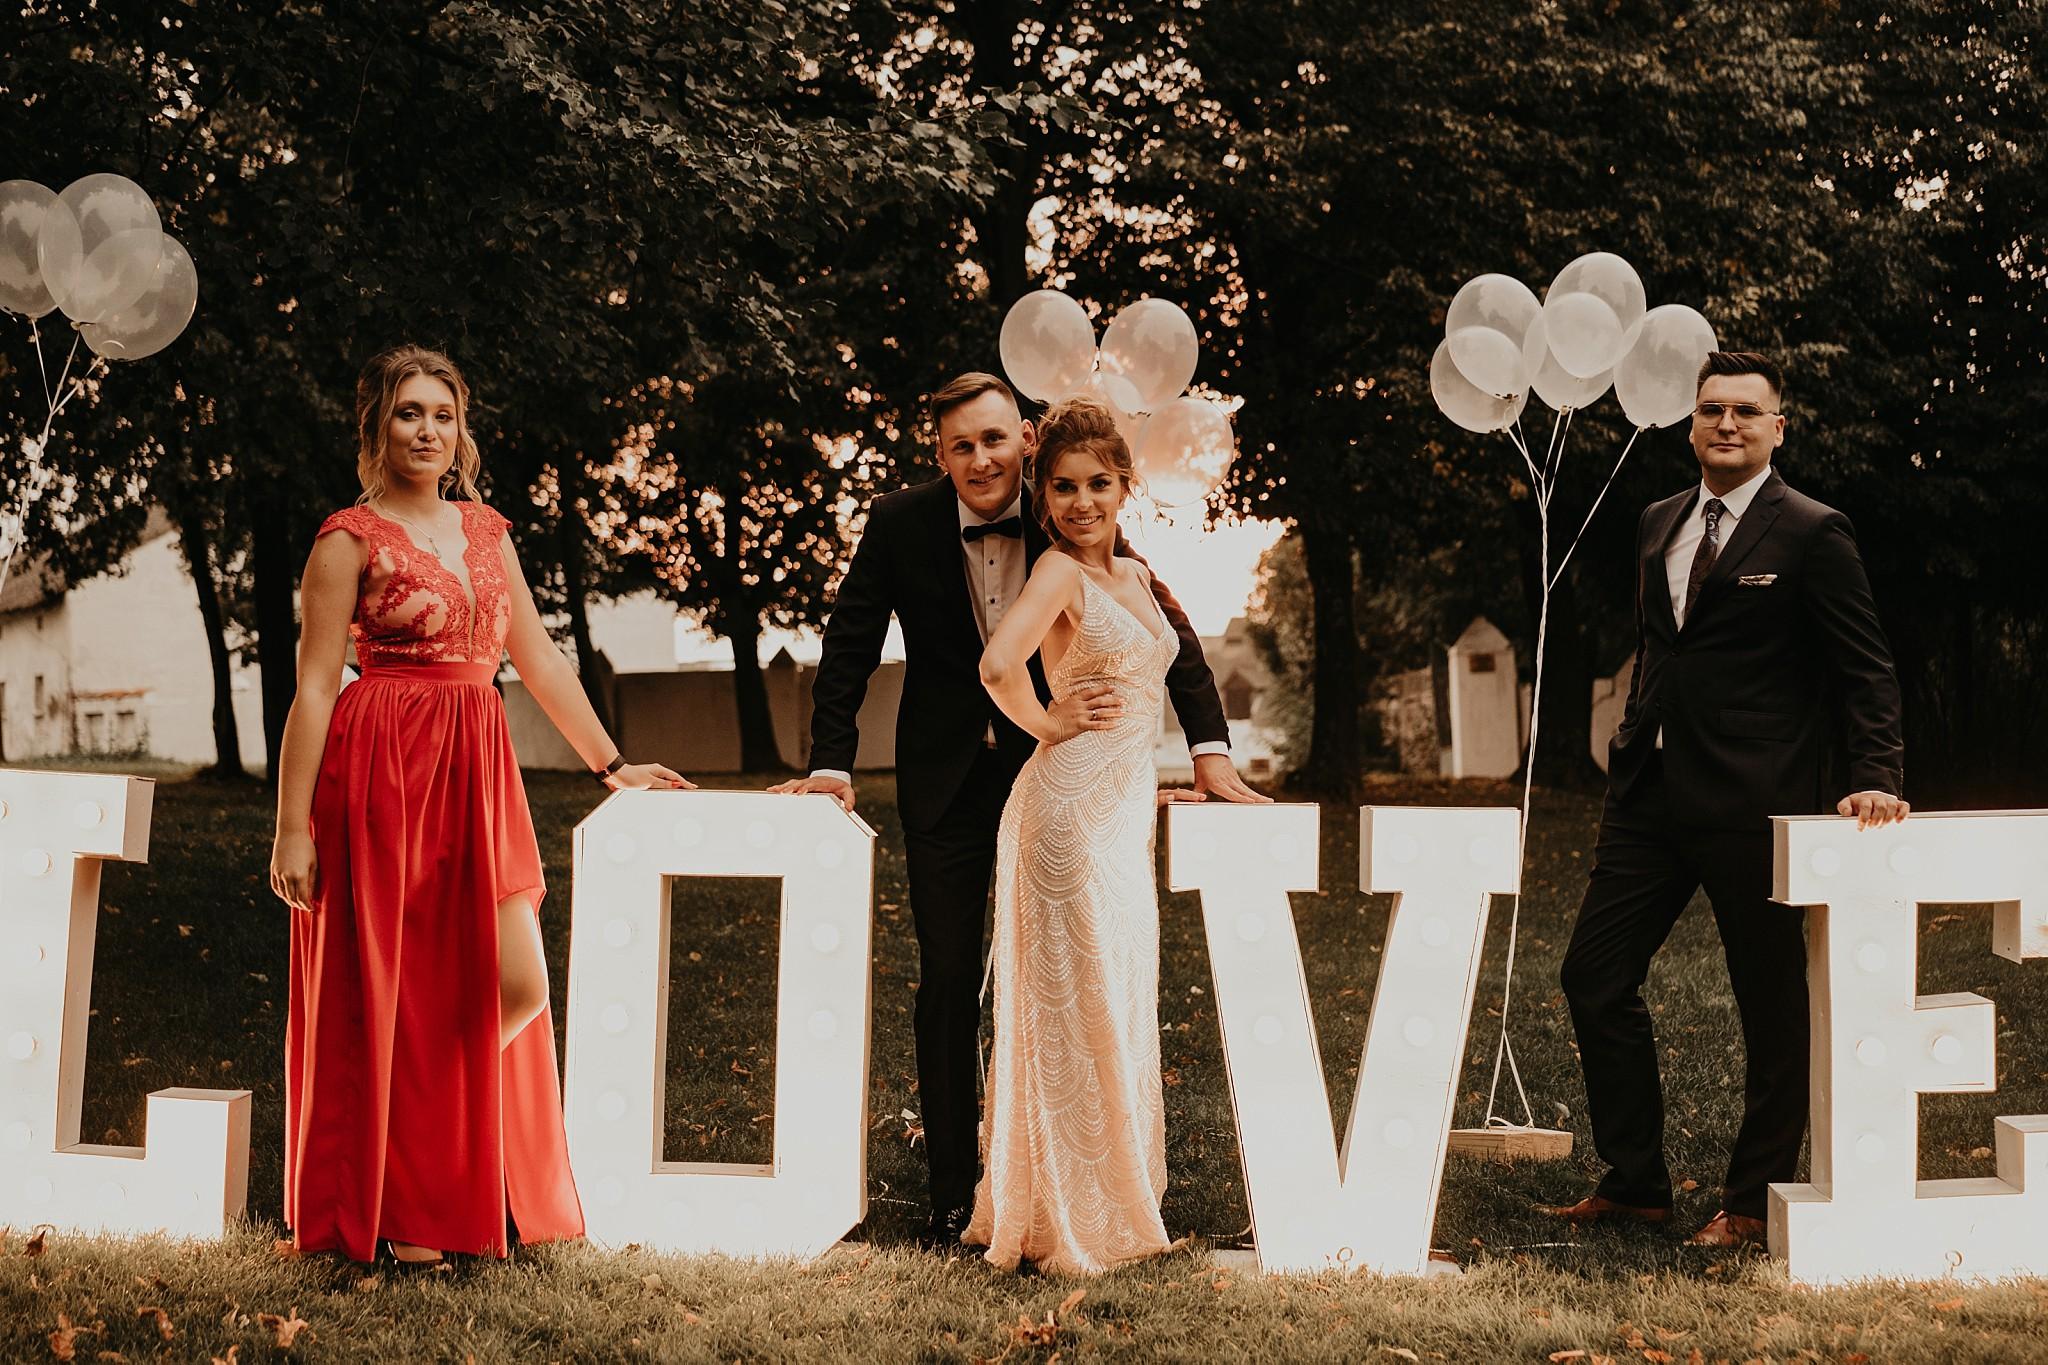 fotograf poznan wesele dobra truskawka piekne wesele pod poznaniem wesele w dobrej truskawce piekna para mloda slub marzen slub koronawirus slub listopad wesele koronawirus 331